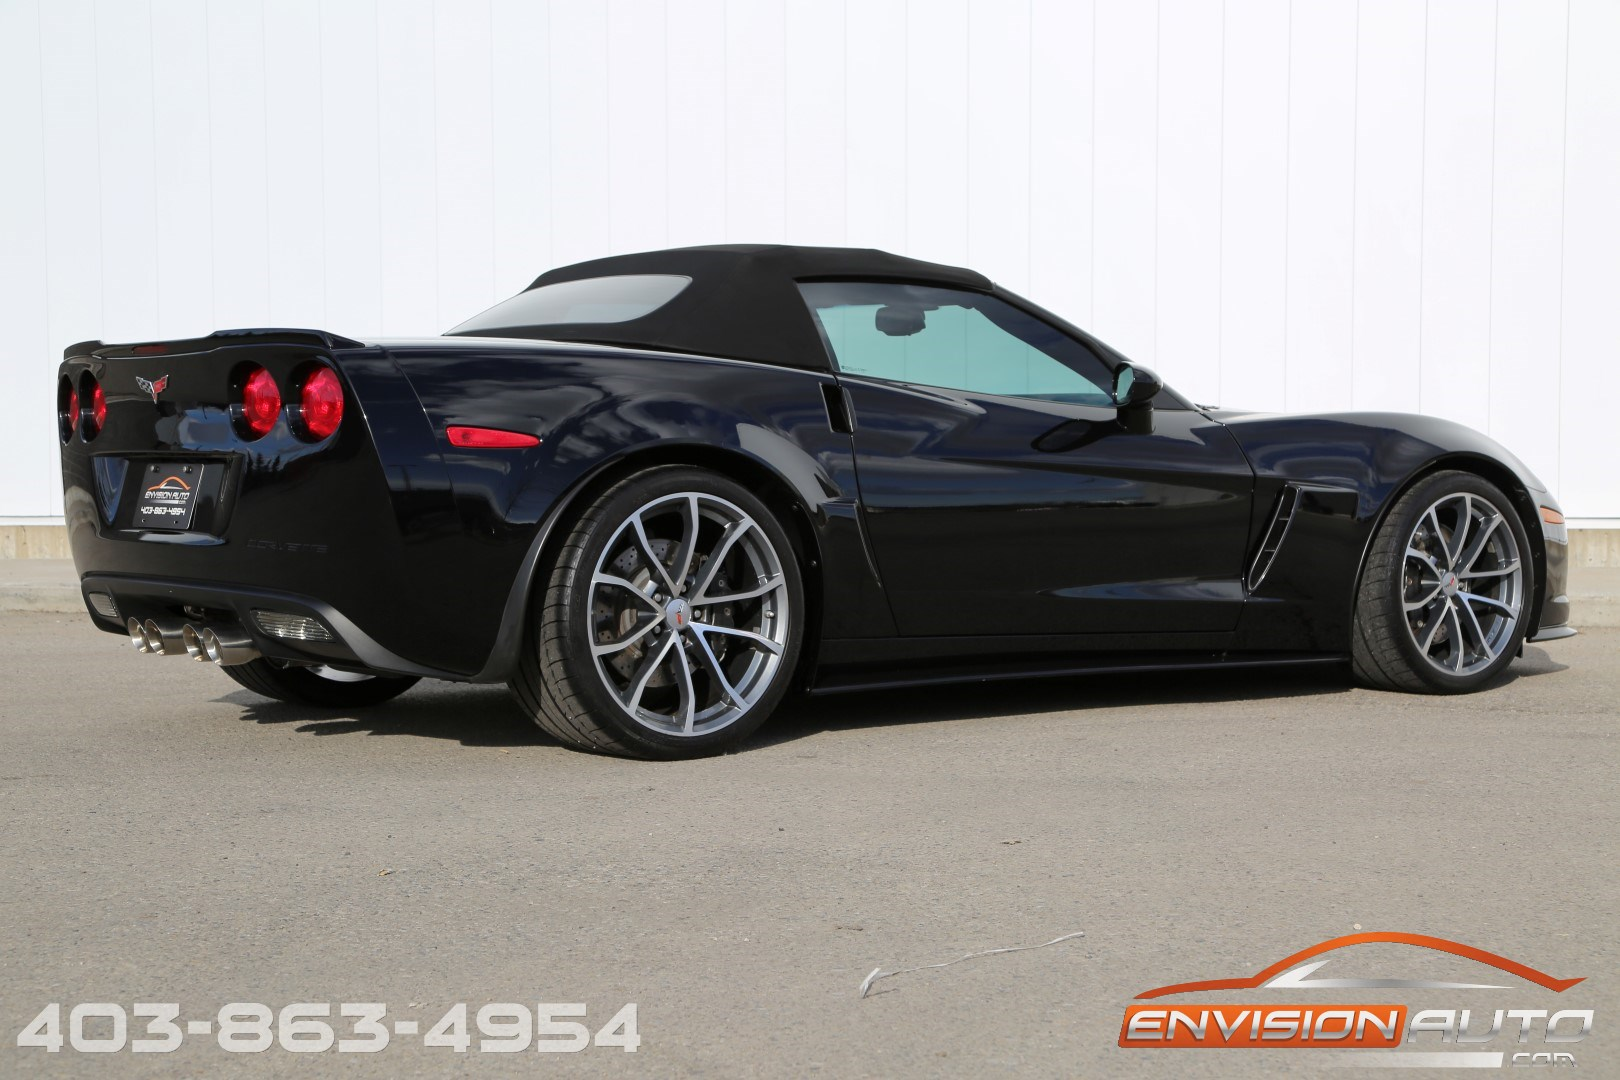 2013 Chevrolet Corvette 427 Convertible 4lt Ls7 7 0l V8 505hp Envision Auto